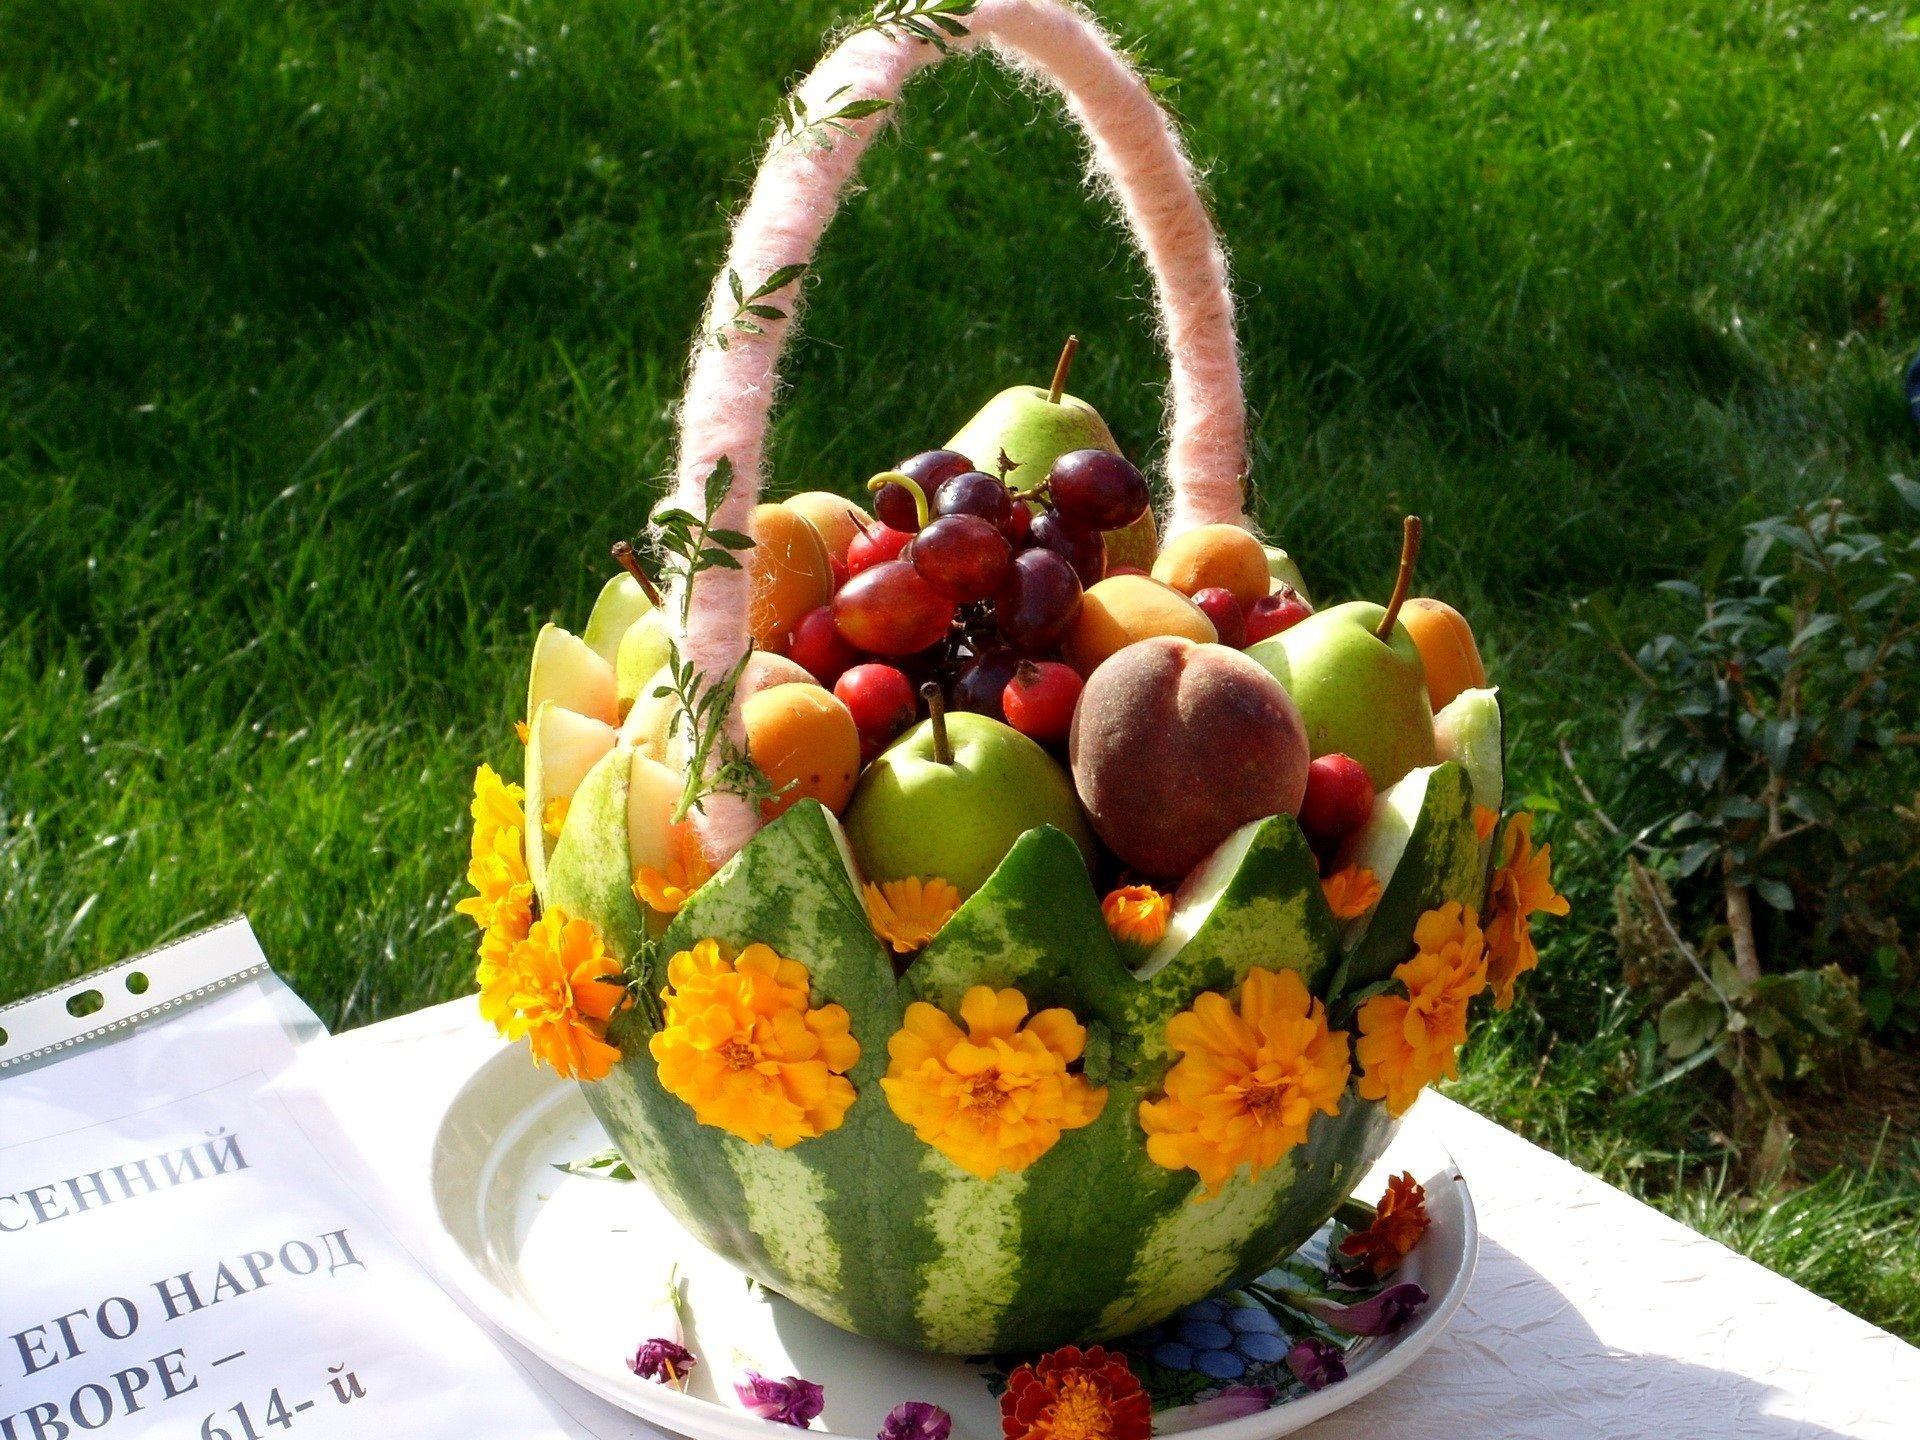 Res: 1920x1440, HD *** Fruit Basket *** Wallpaper, fresh, food, basket, salad, fruits, nature,3D & Abstract, paysages